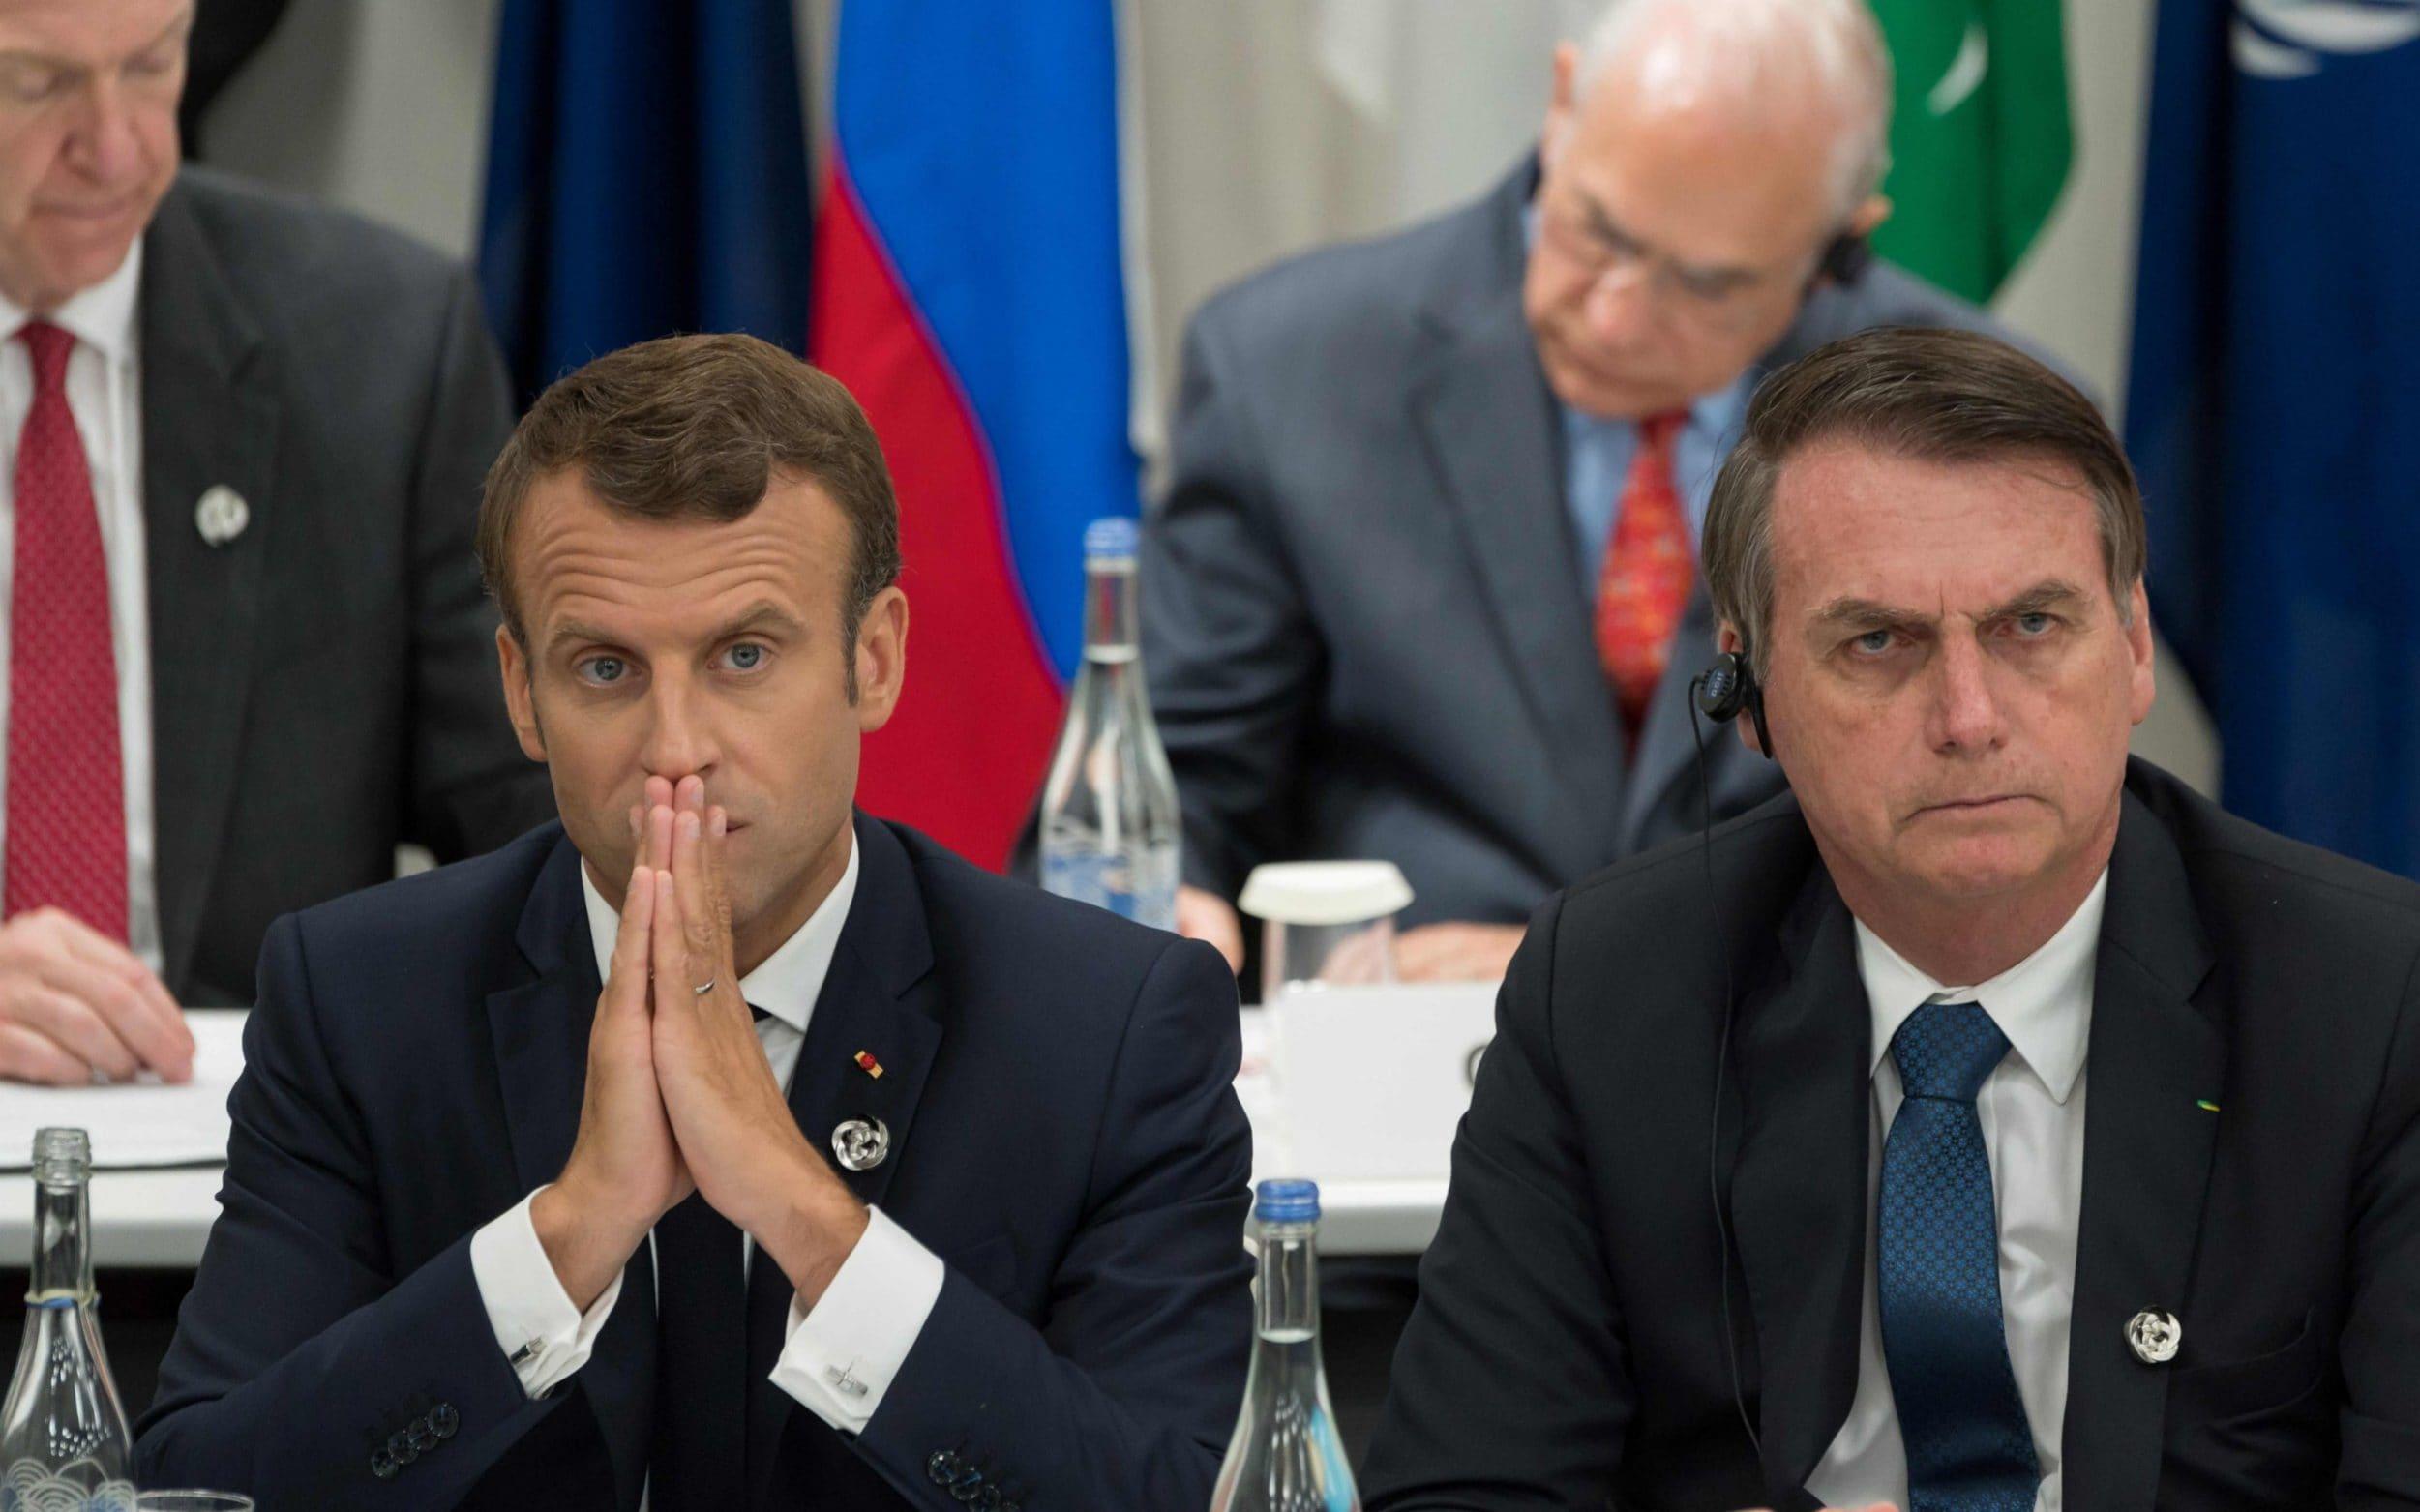 Macron attacks extraordinarily rude Bolsonaro after insults about wife Brigitte